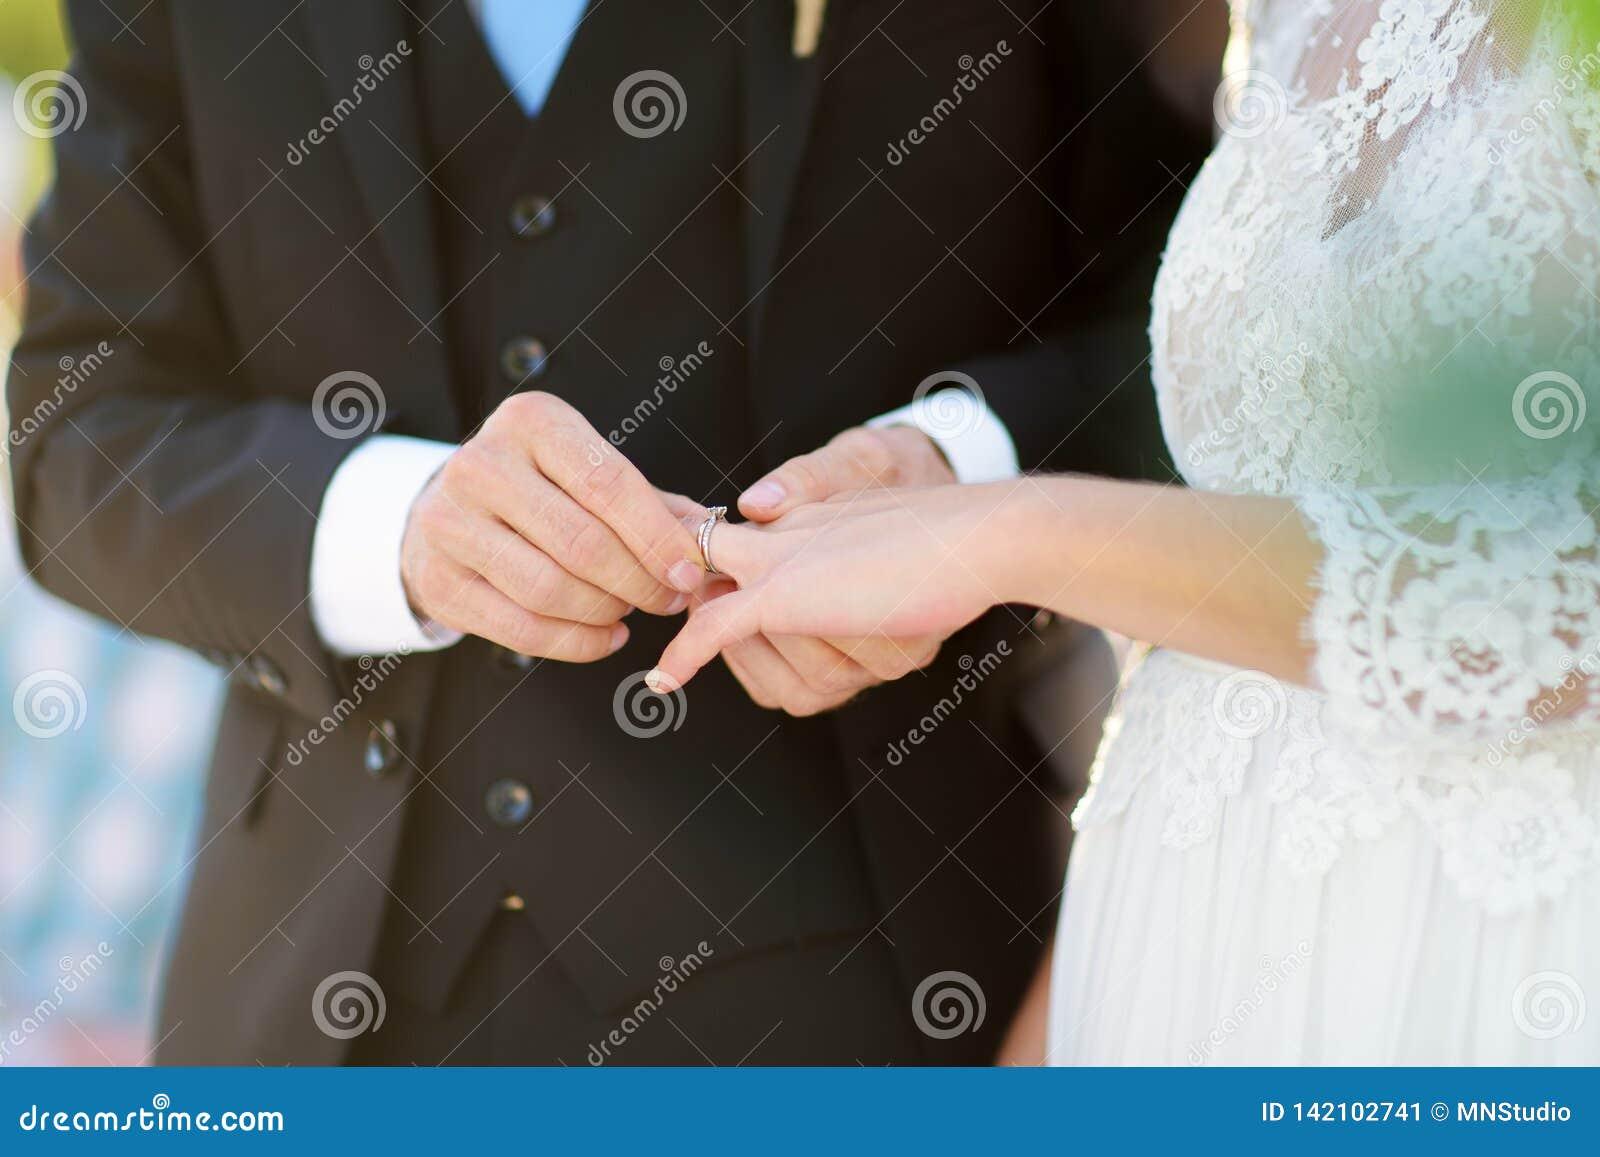 Groom Putting Wedding Ring On Bride S Finger During Wedding